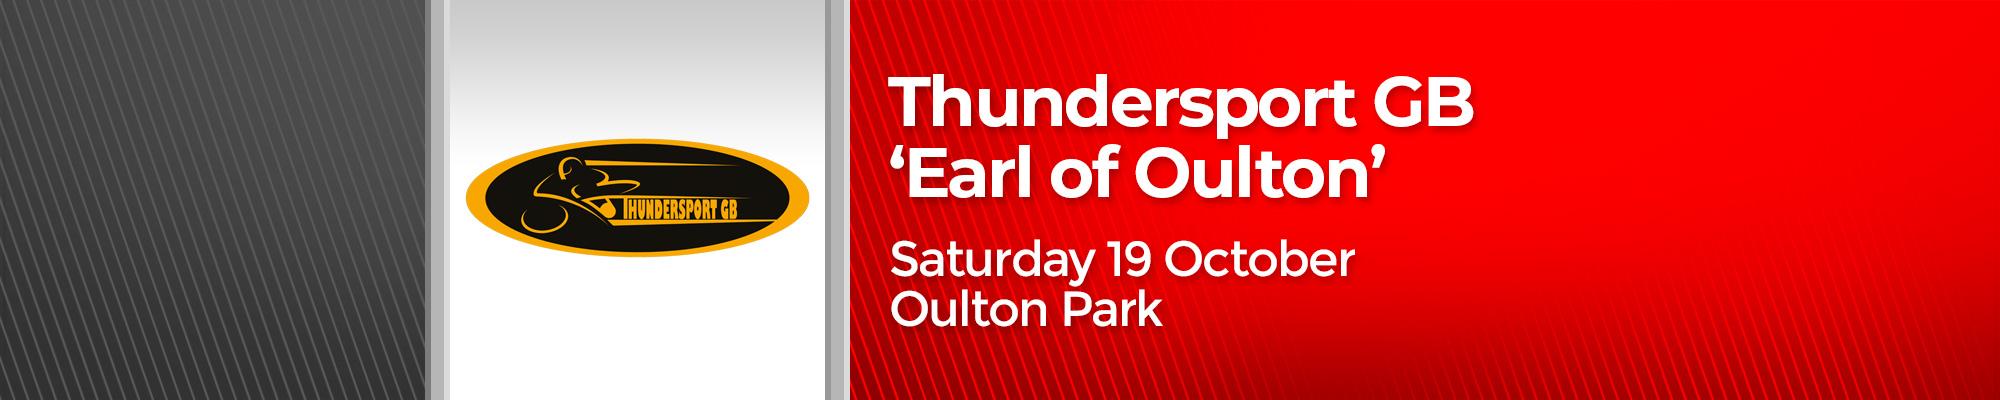 Thundersport GB 'Earl of Oulton'